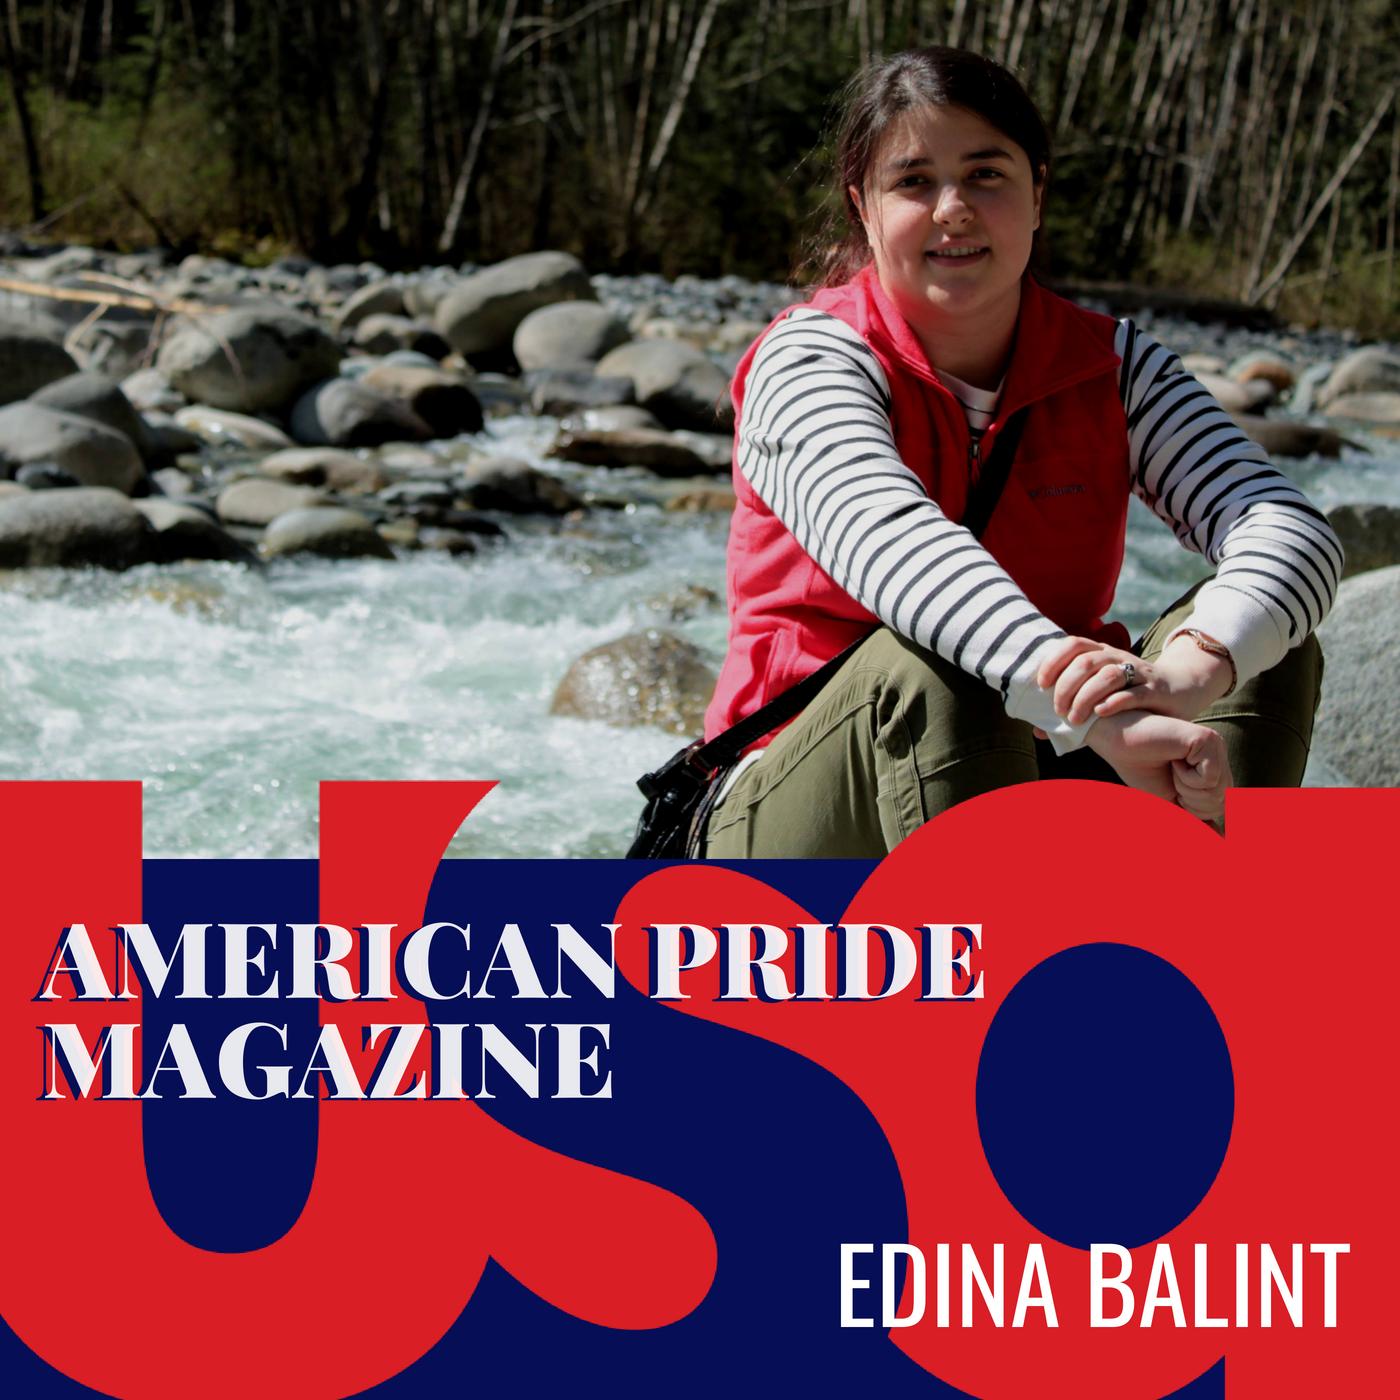 Edina Balint Her New Release Seaside Boulevard